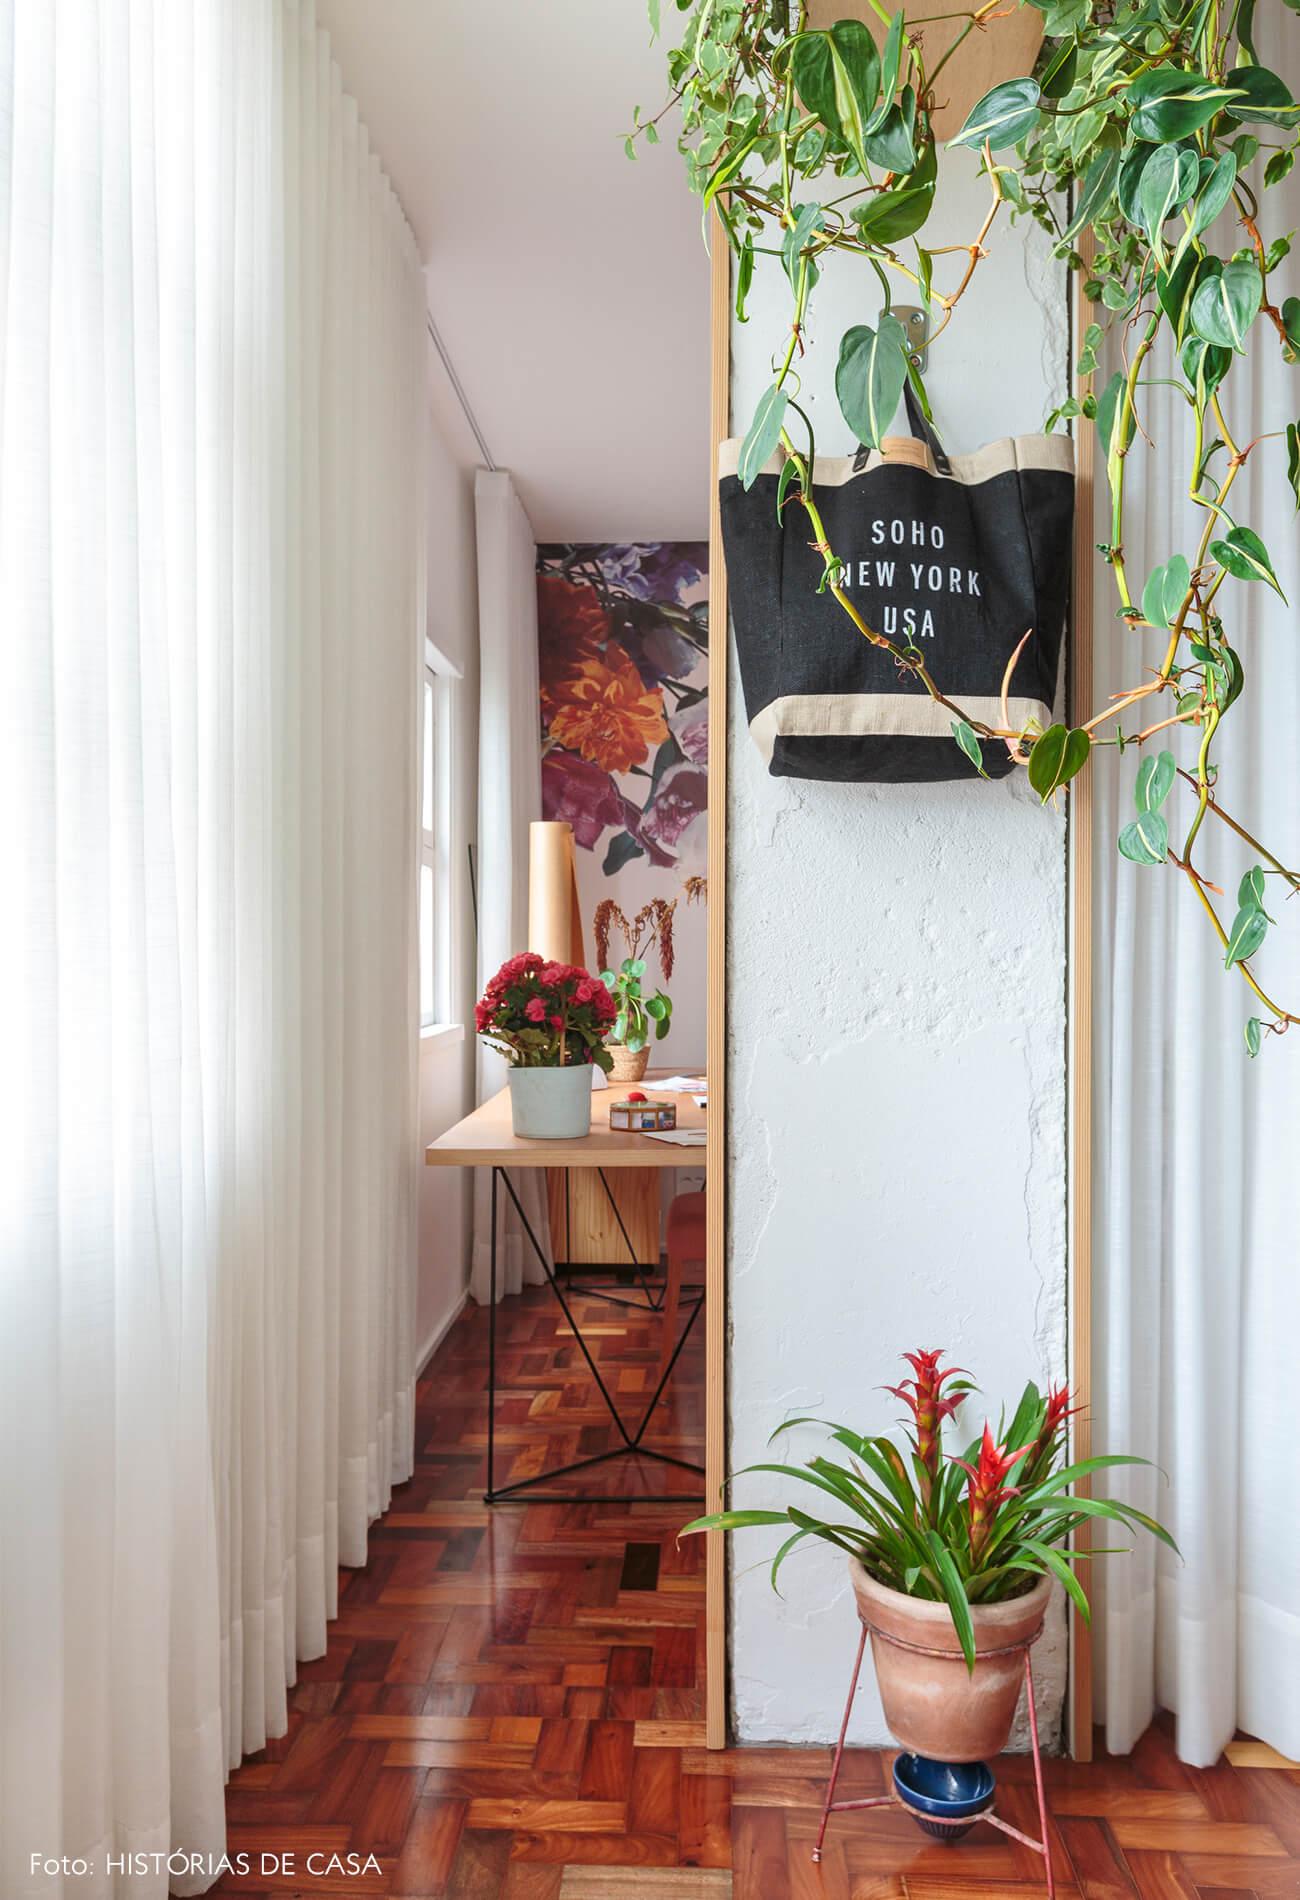 sala-home-office-atelie-parede-banca-piso-madeira-plantas-suspensas-jiboias-vaso-barro-mesa-madeira-papel-de-parede-flores-rosa